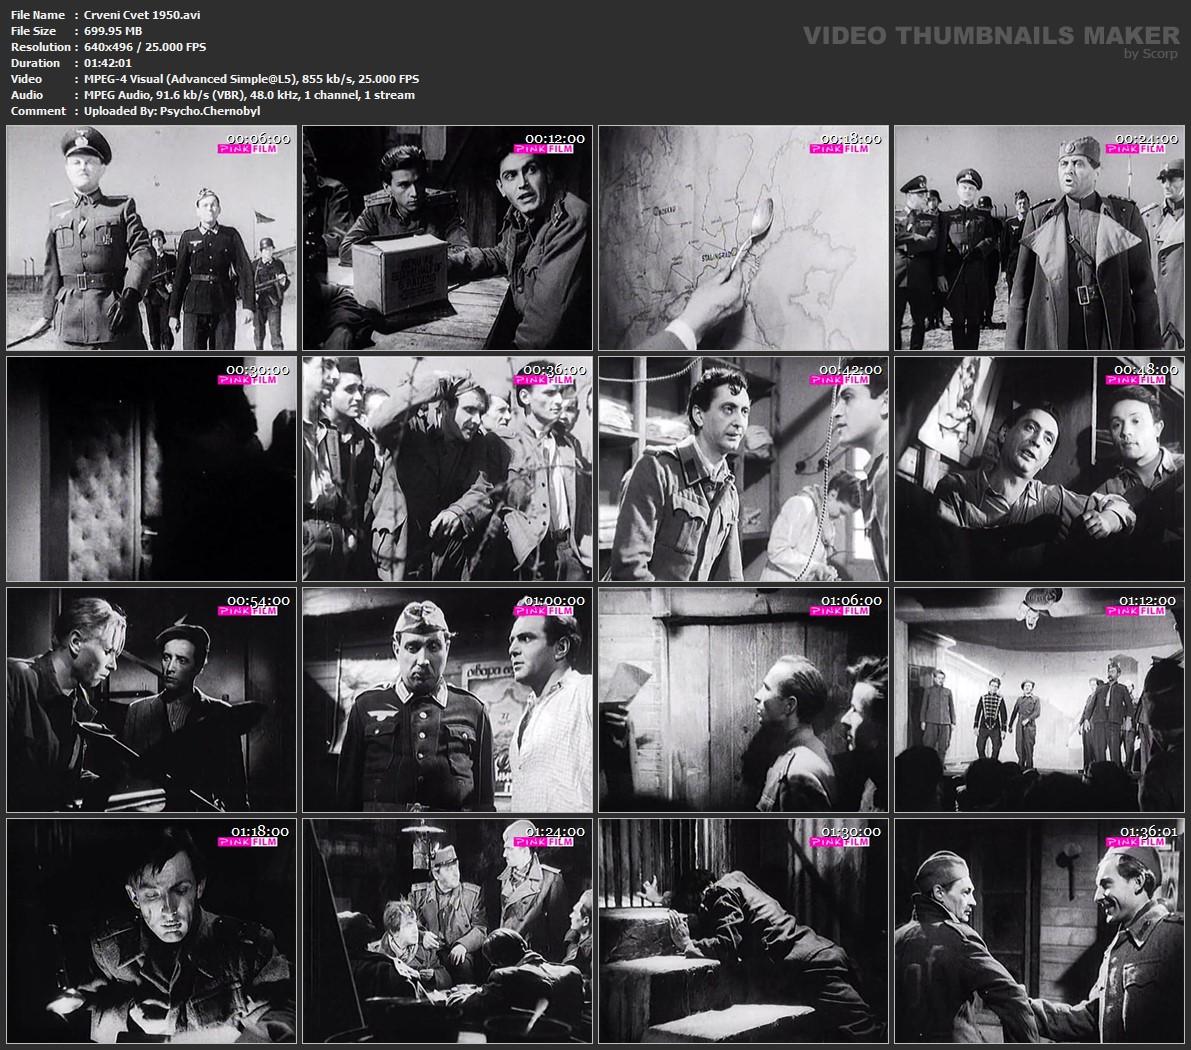 Crveni-Cvet-1950-avi.jpg